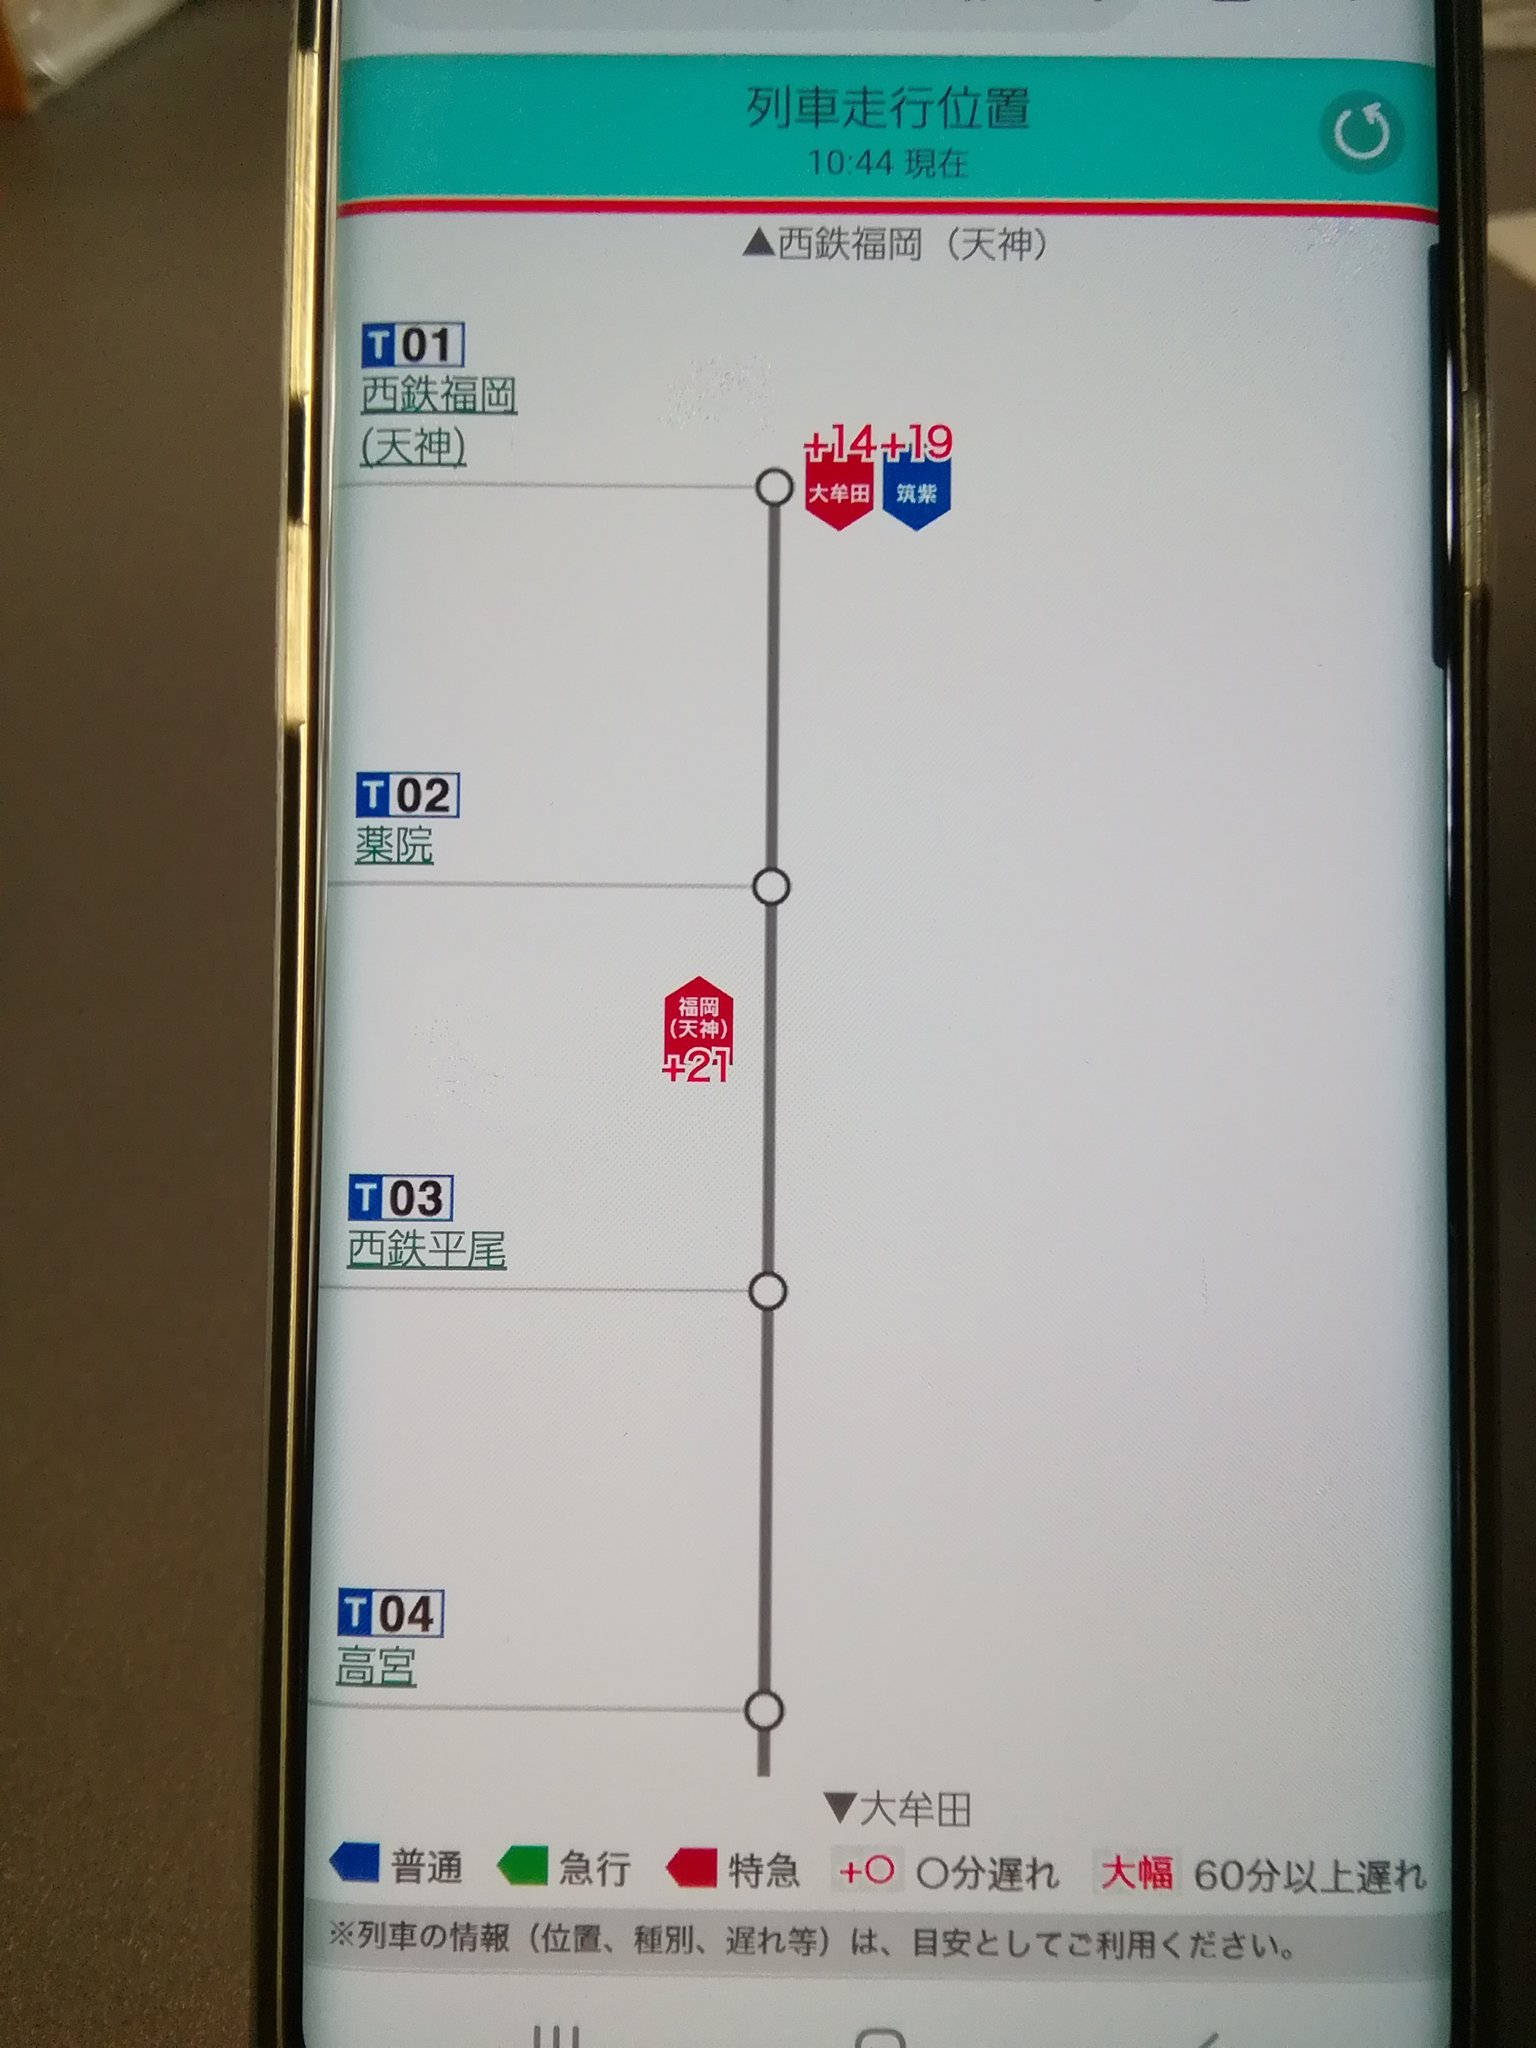 画像,10時22分頃、西鉄平尾駅で人身事故発生福岡(天神)~大橋間で運転見合せ https://t.co/WK2s1xxhgl…